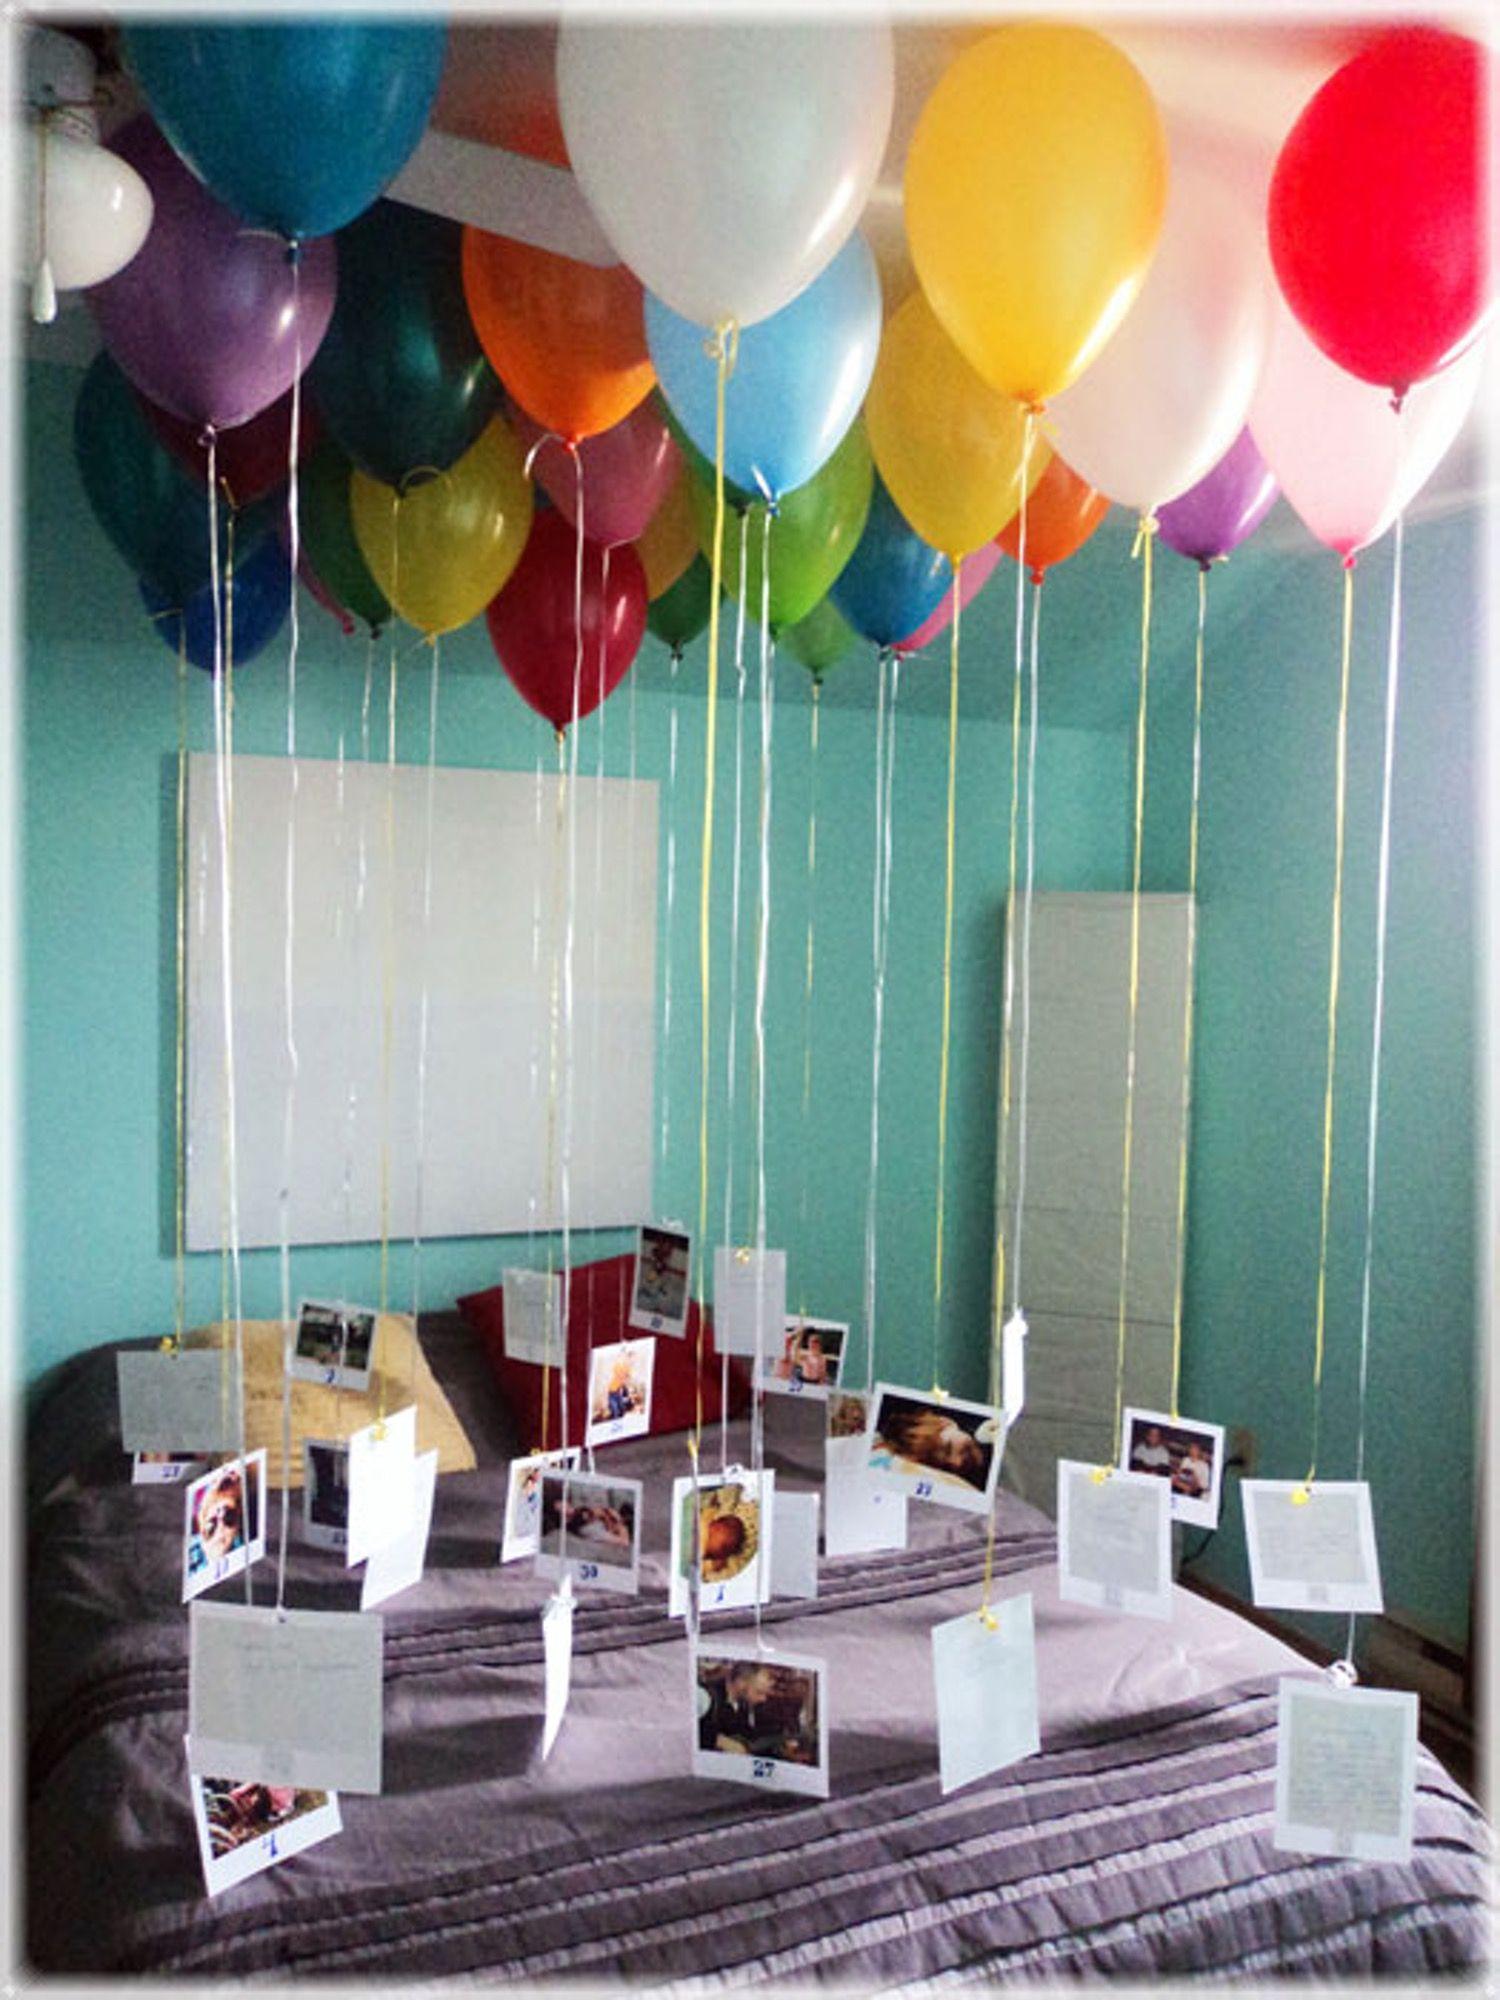 Balloons + Photographs = Fun Party Decor  Lovely Green Lifestyle